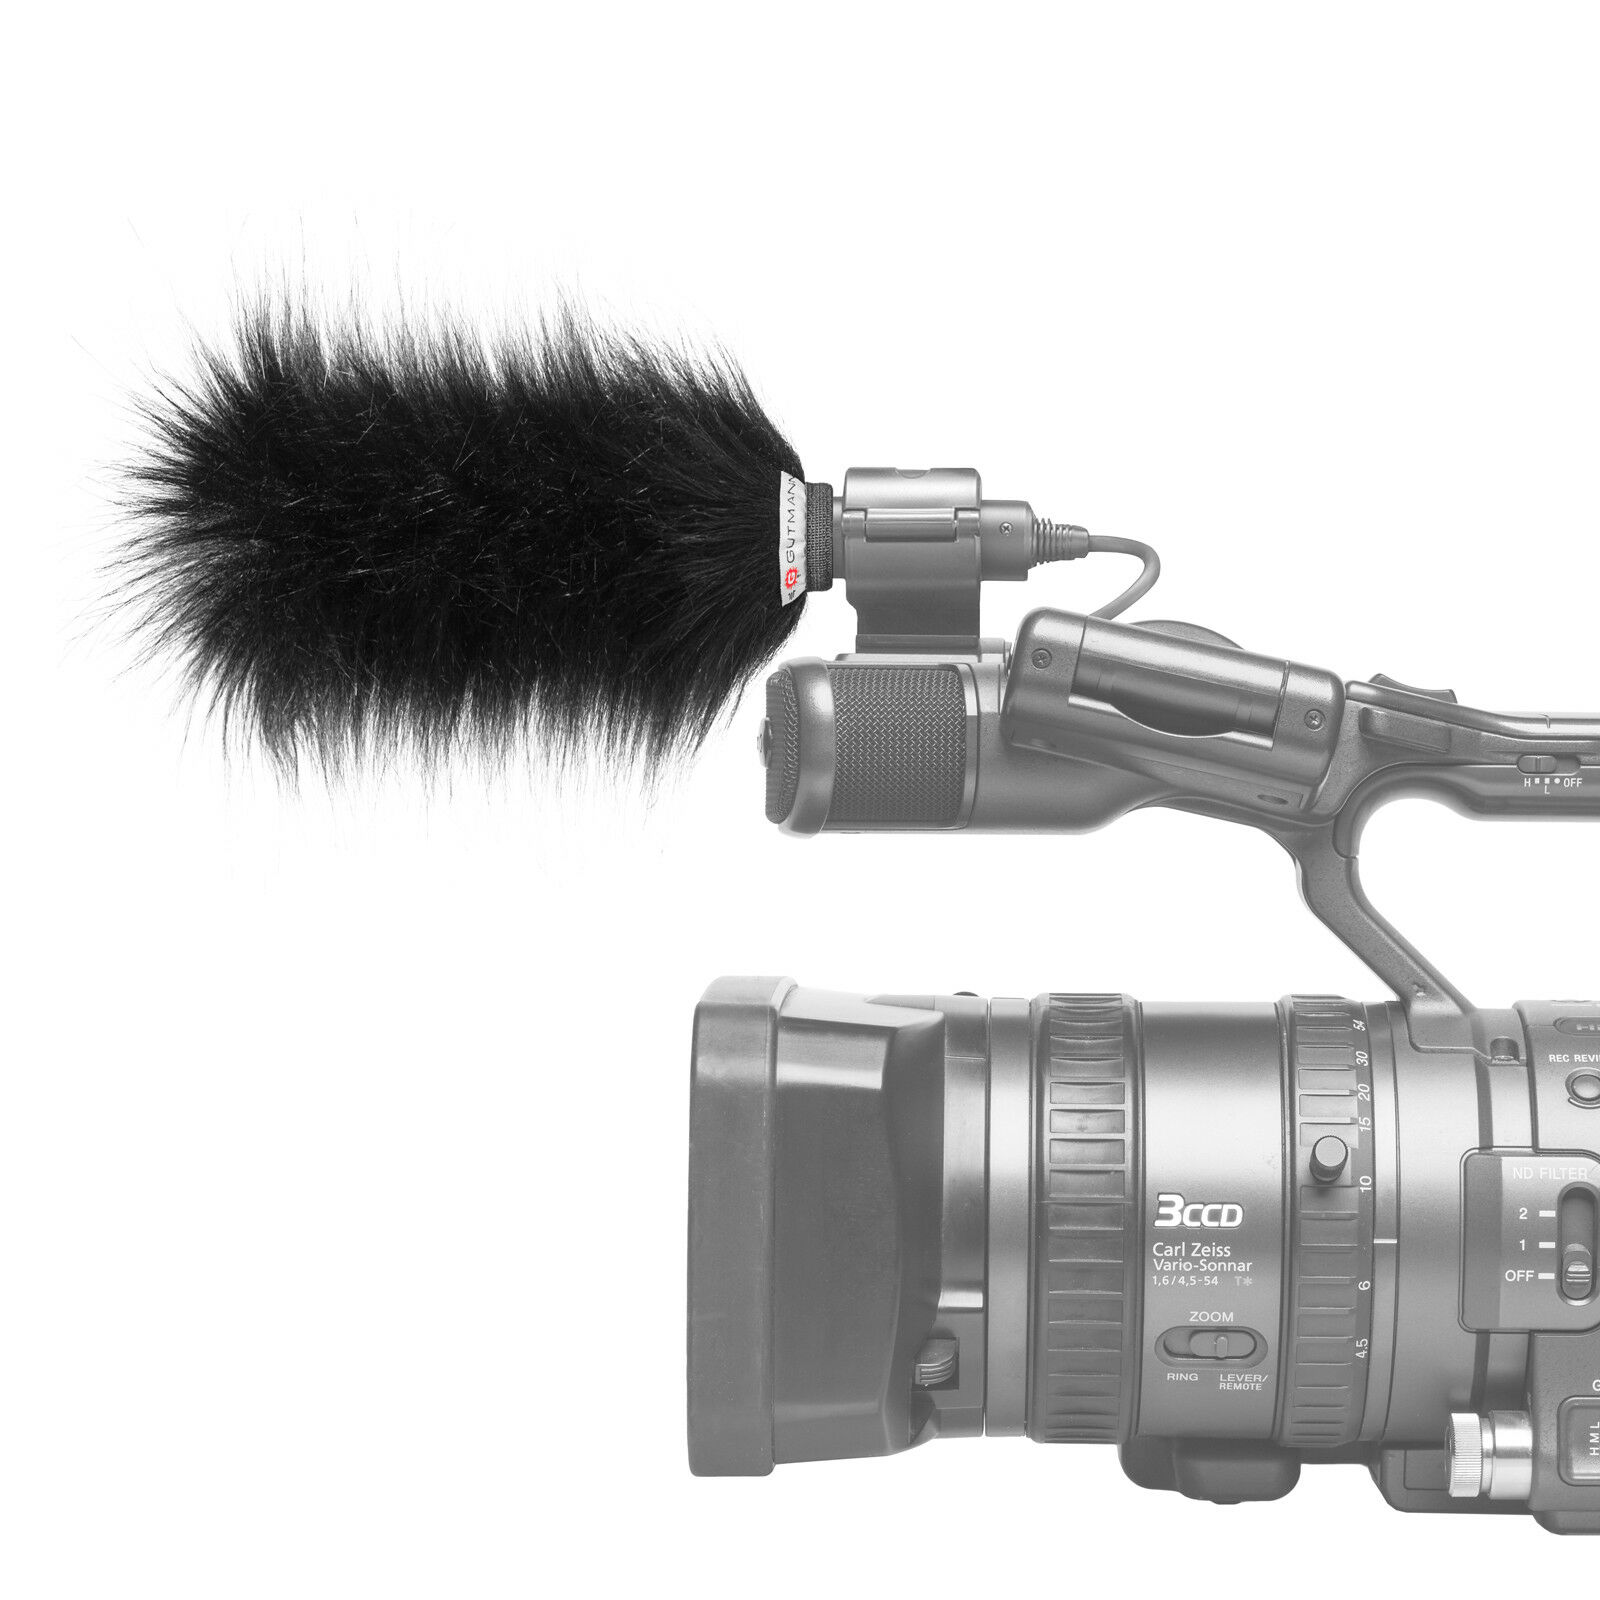 Gutmann Microphone Fur Windscreen Windshield for Sony PDW-510 / PDW-510P